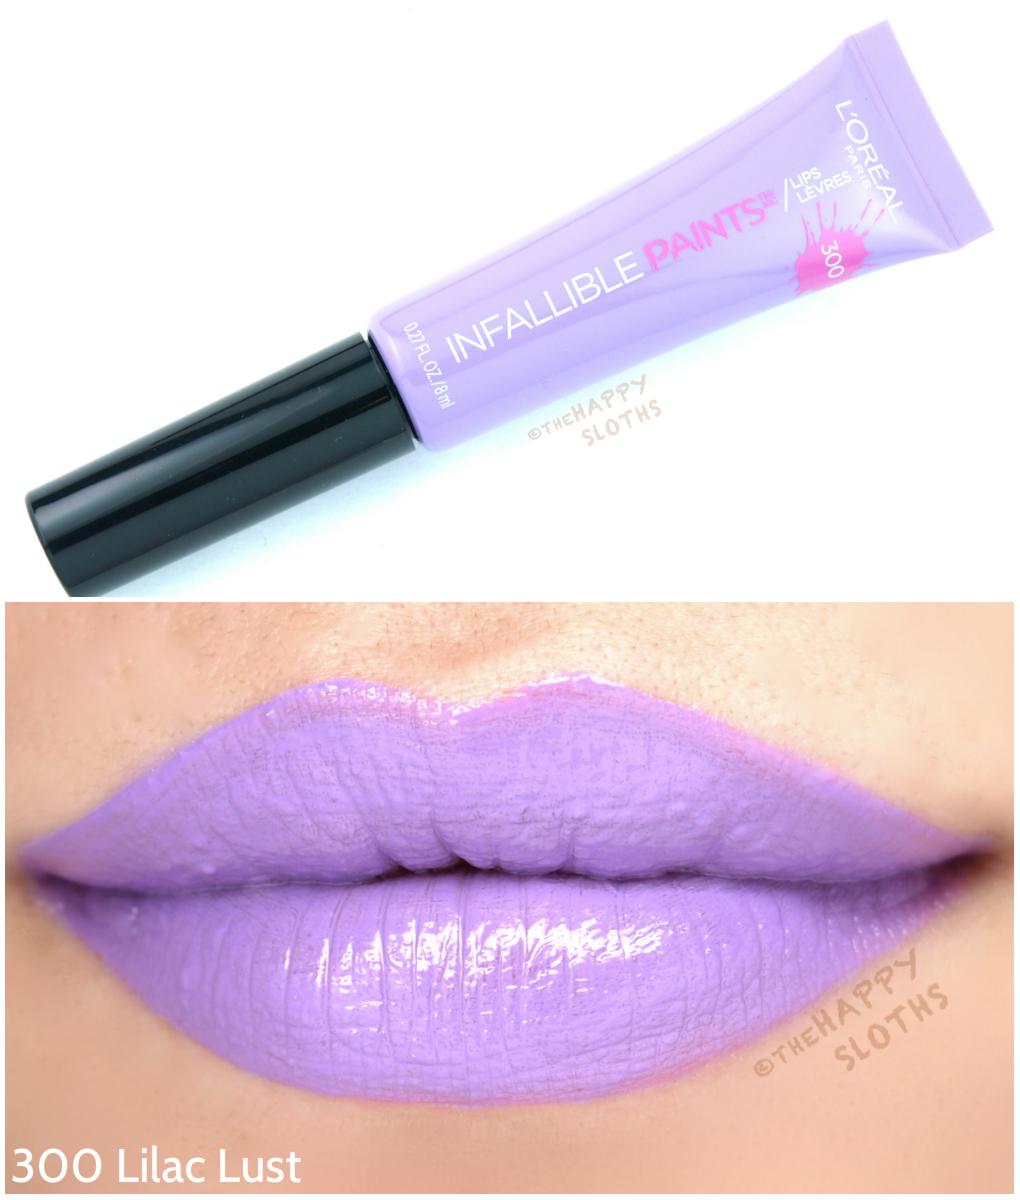 L'Oreal Infallible Lip Paints 300 Lilac Lust